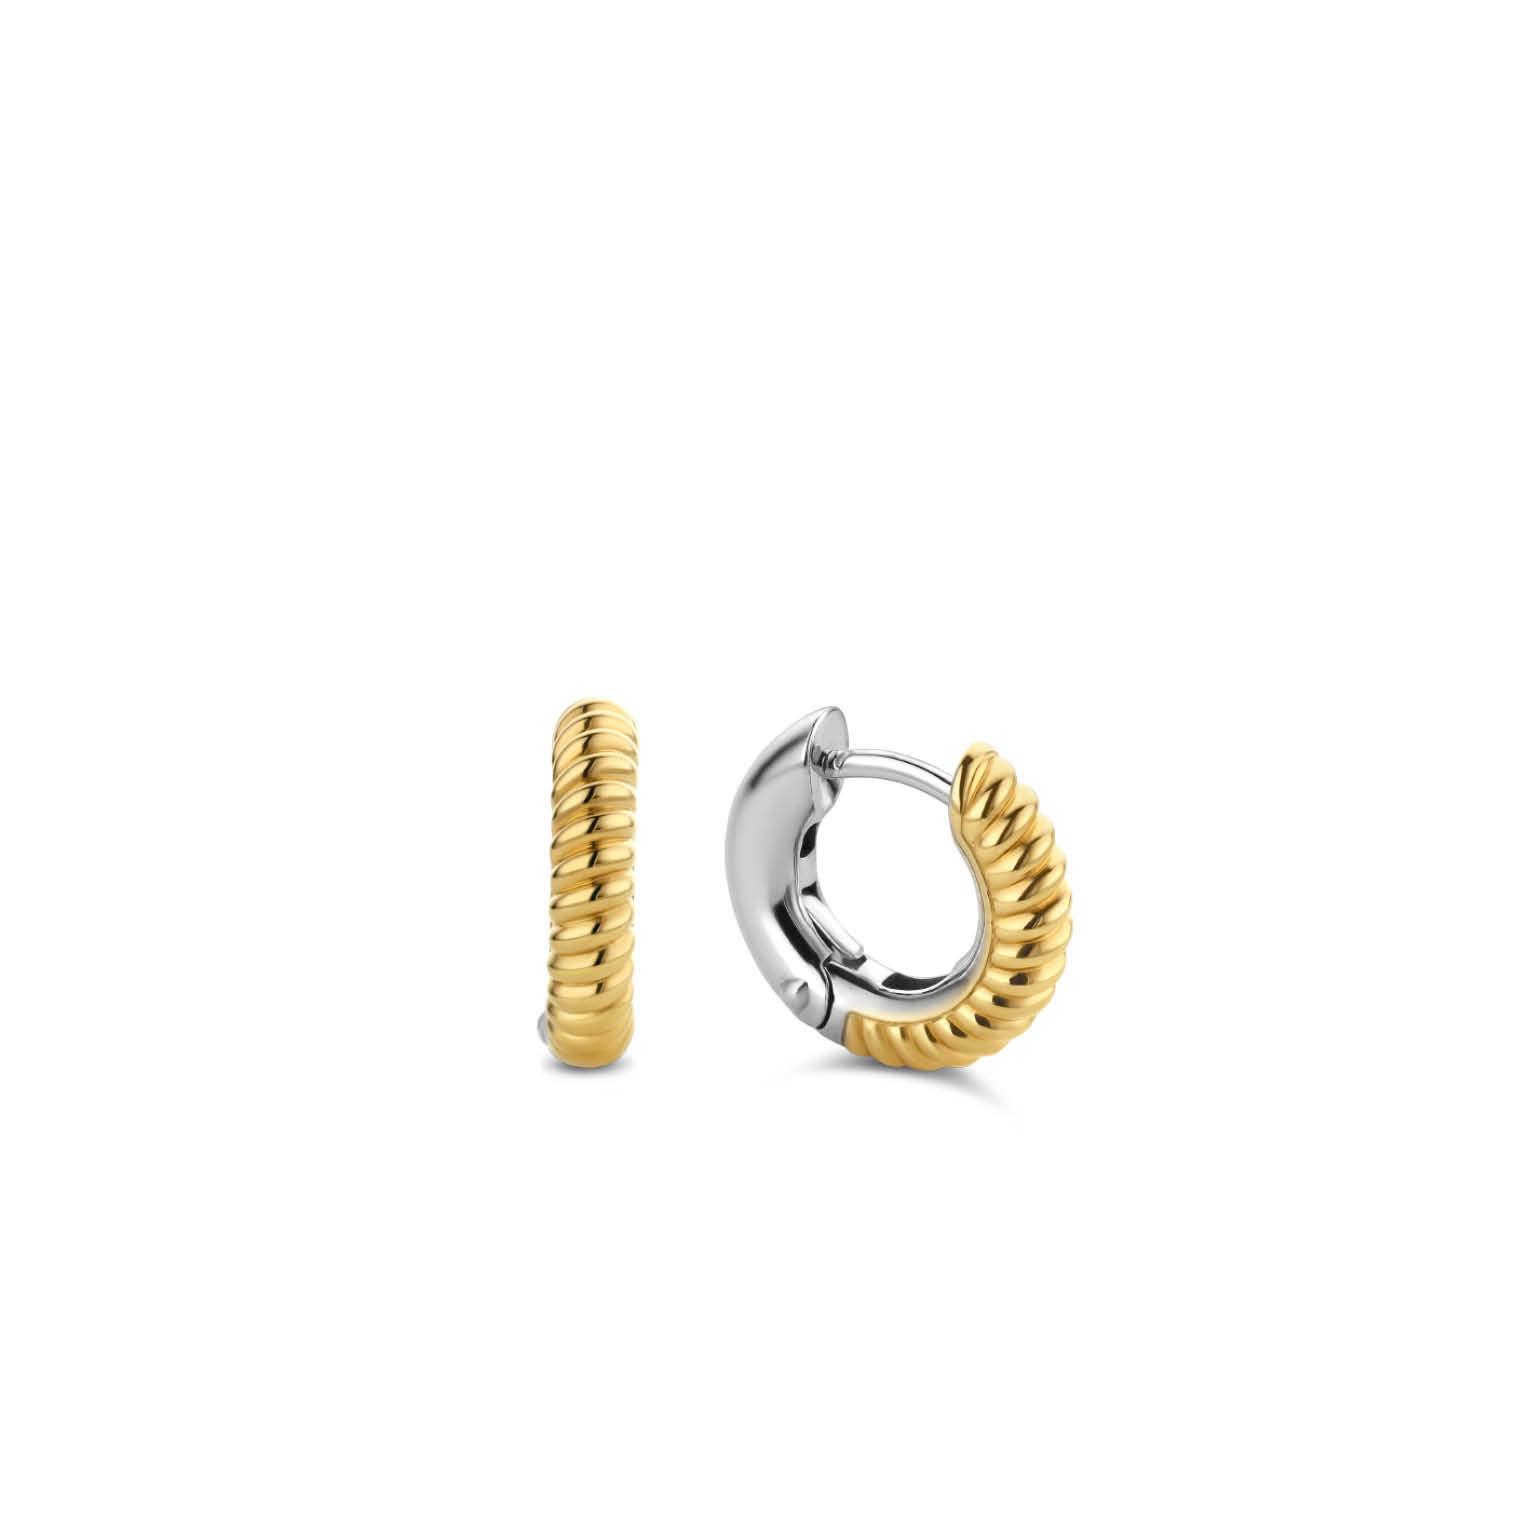 TI SENTO - Milano Earrings 7210YT-3